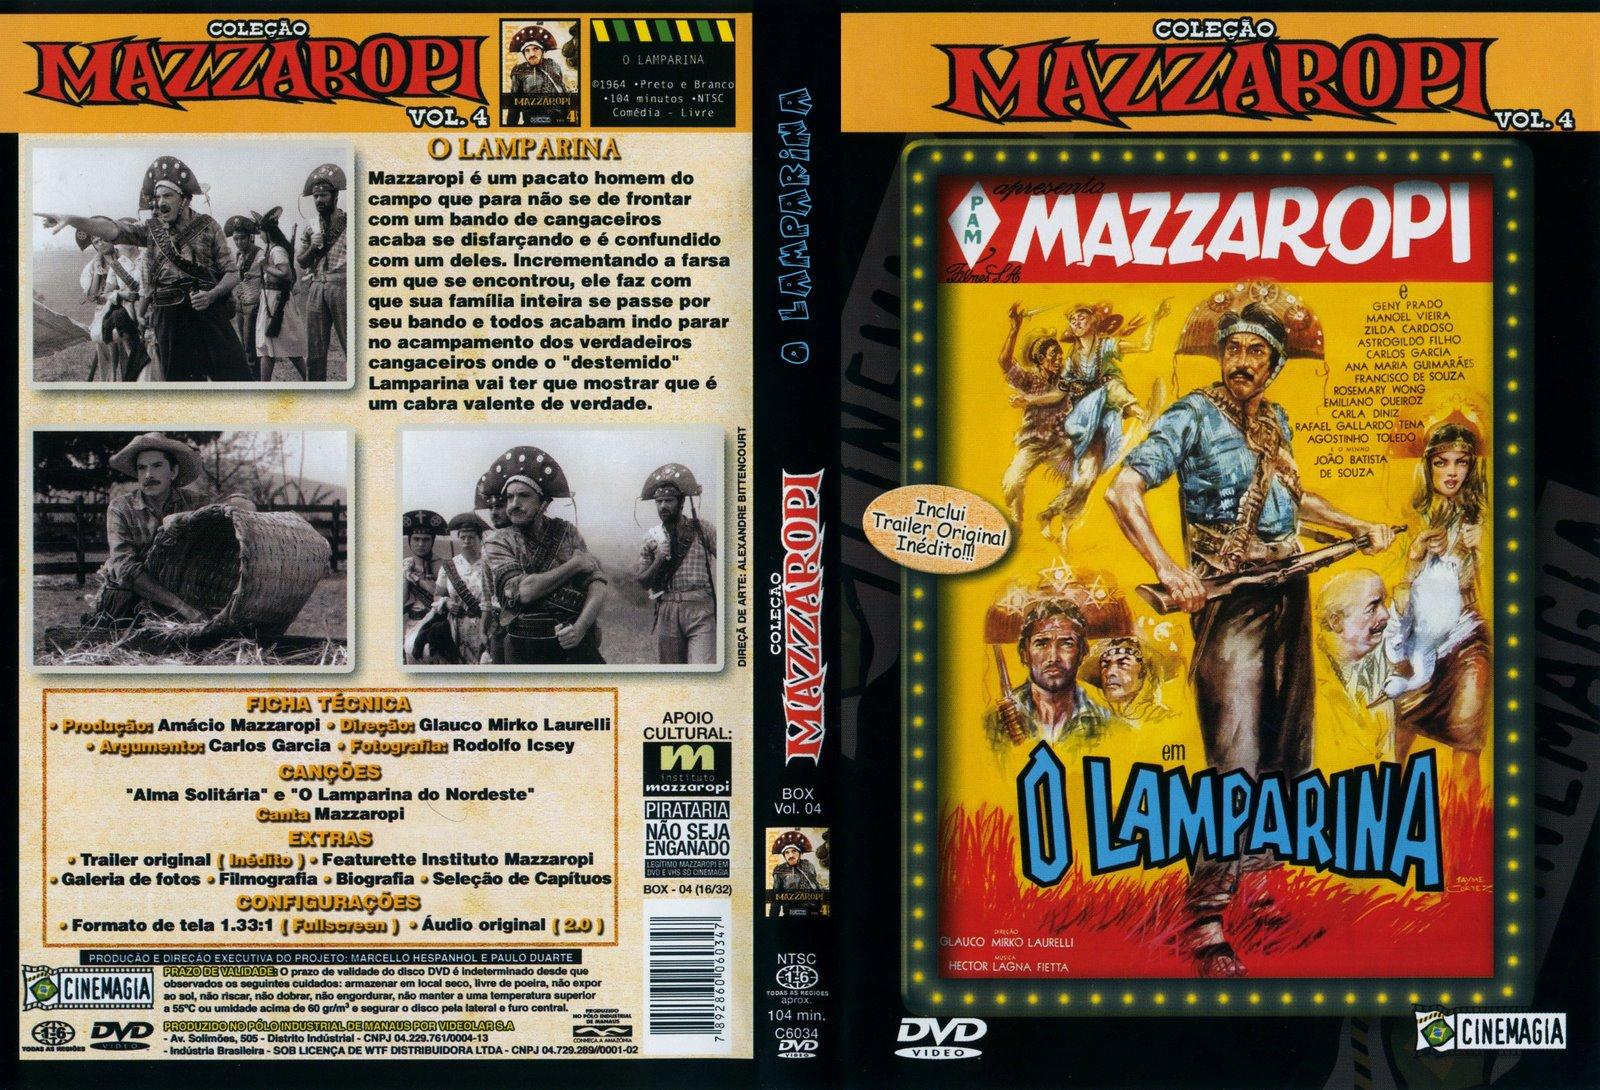 filme mazzaropi o lamparina completo